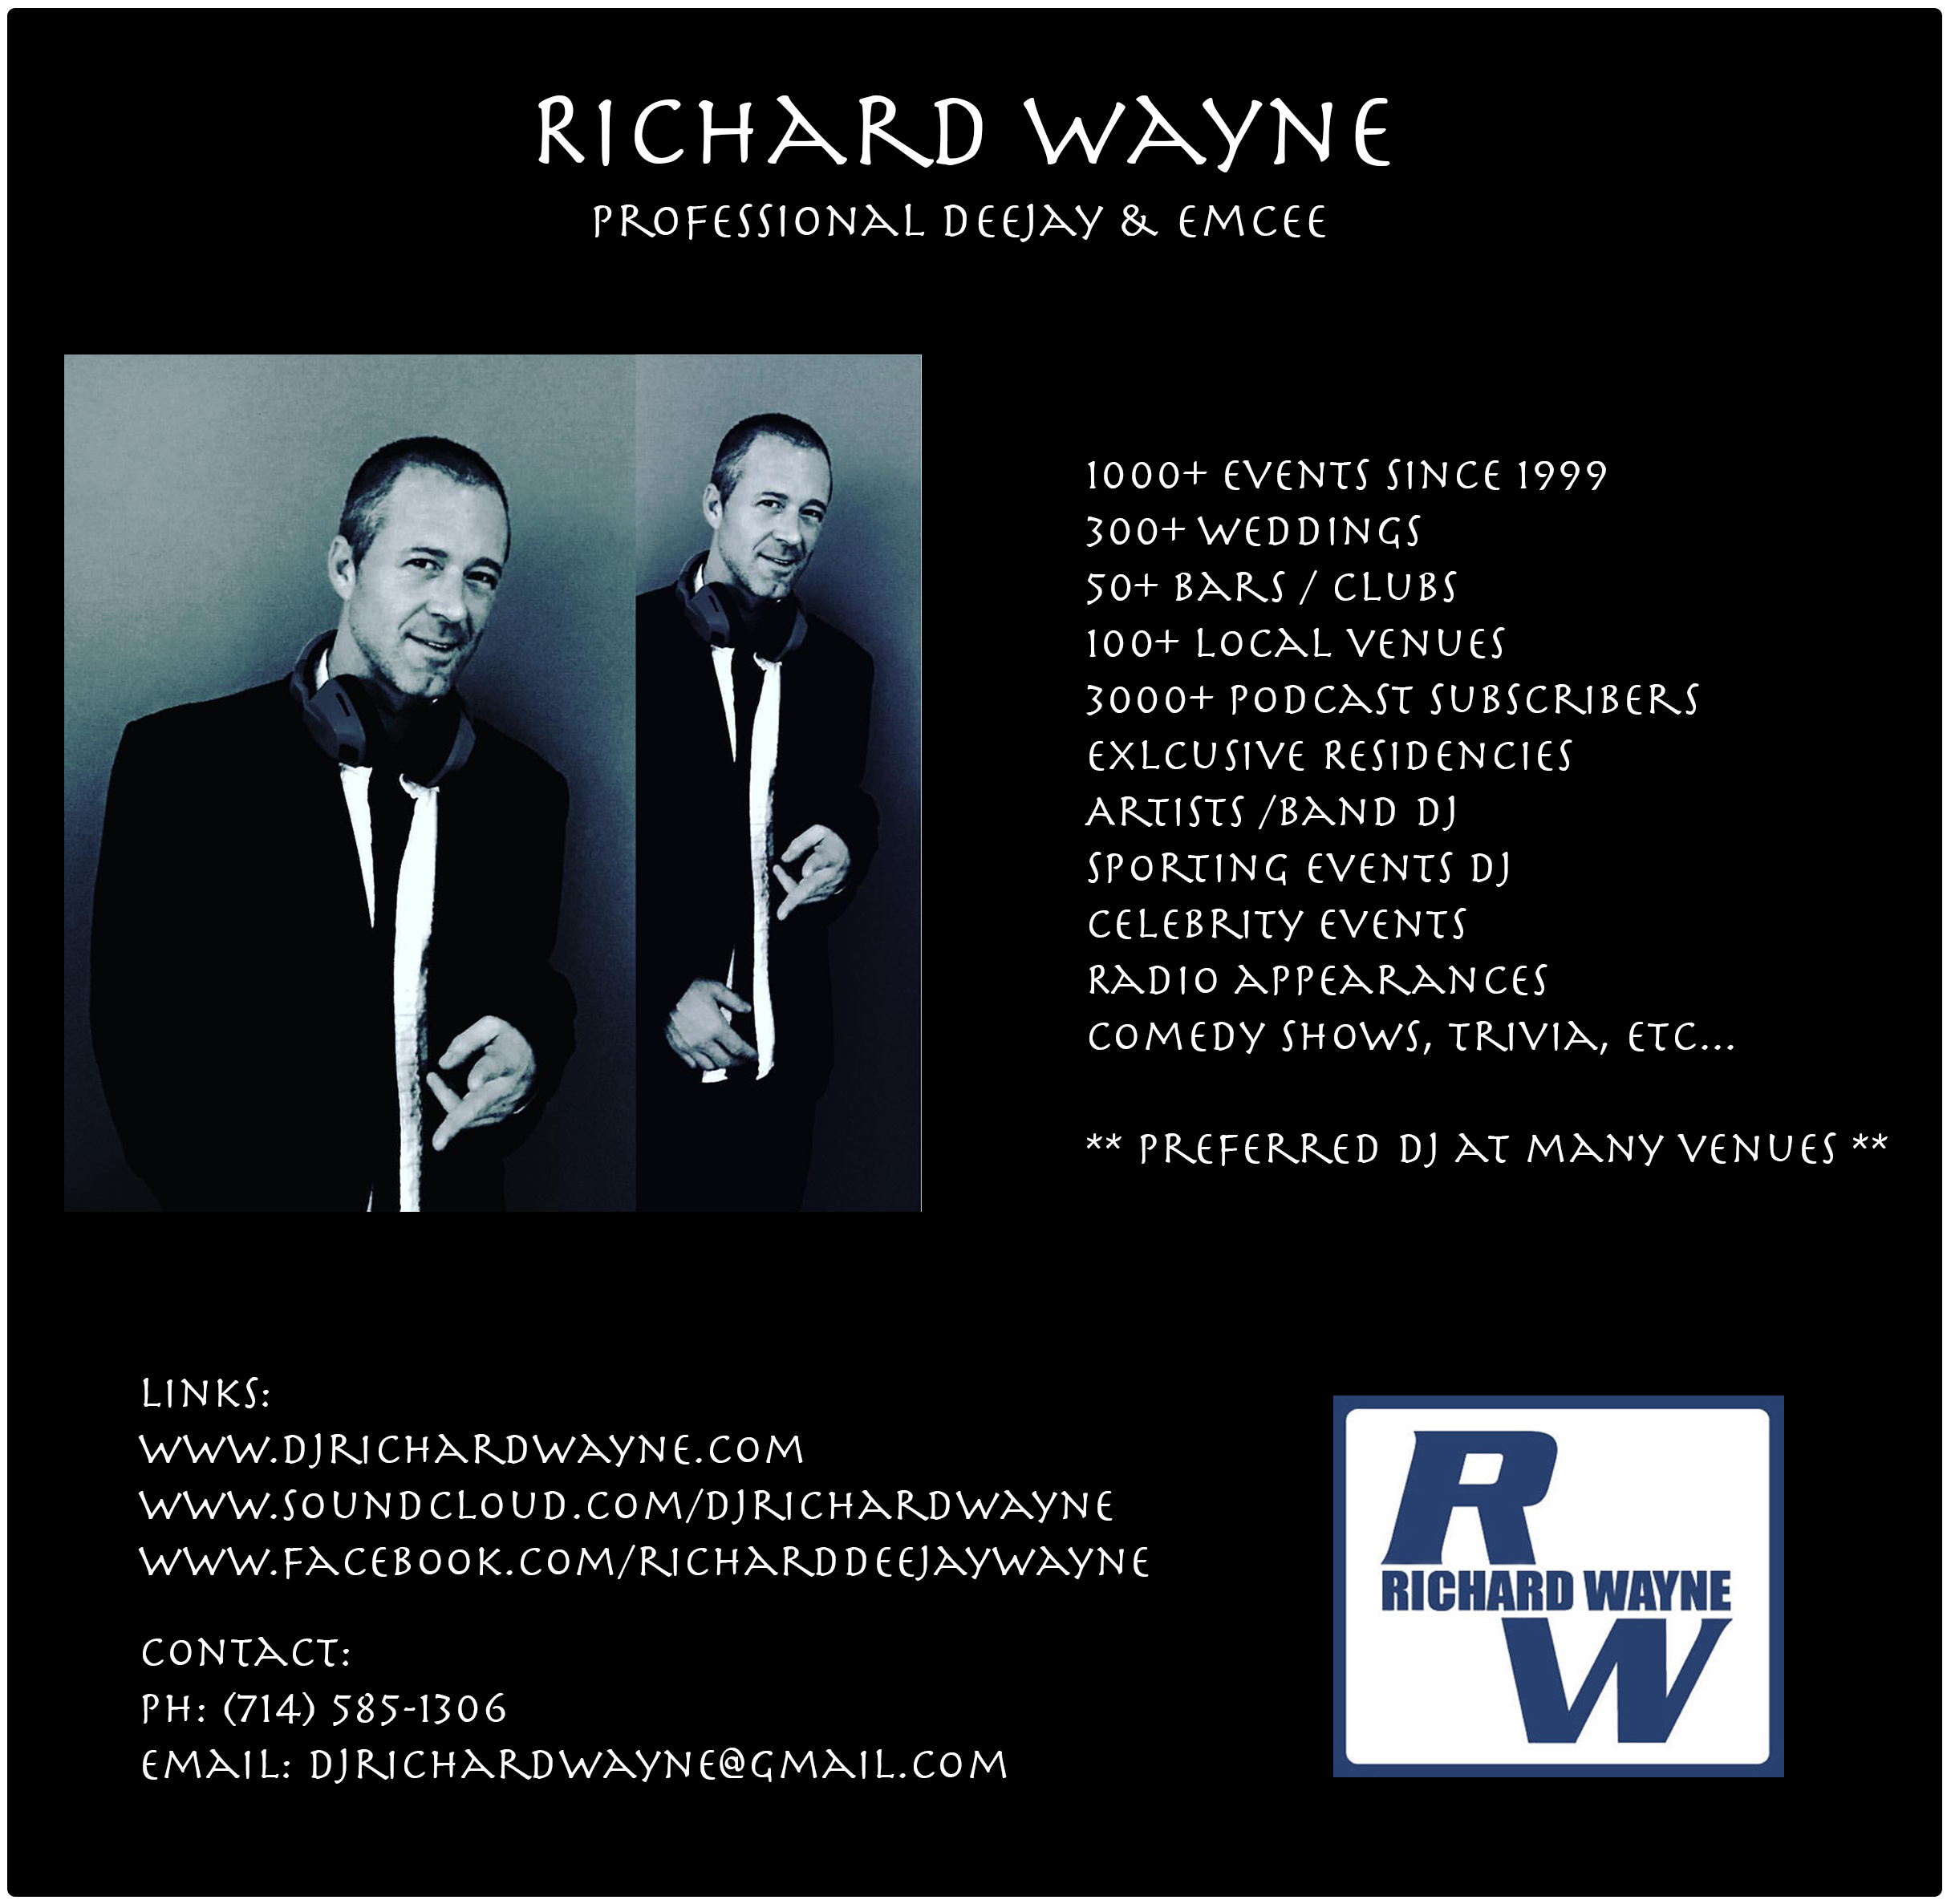 Richard Wayne